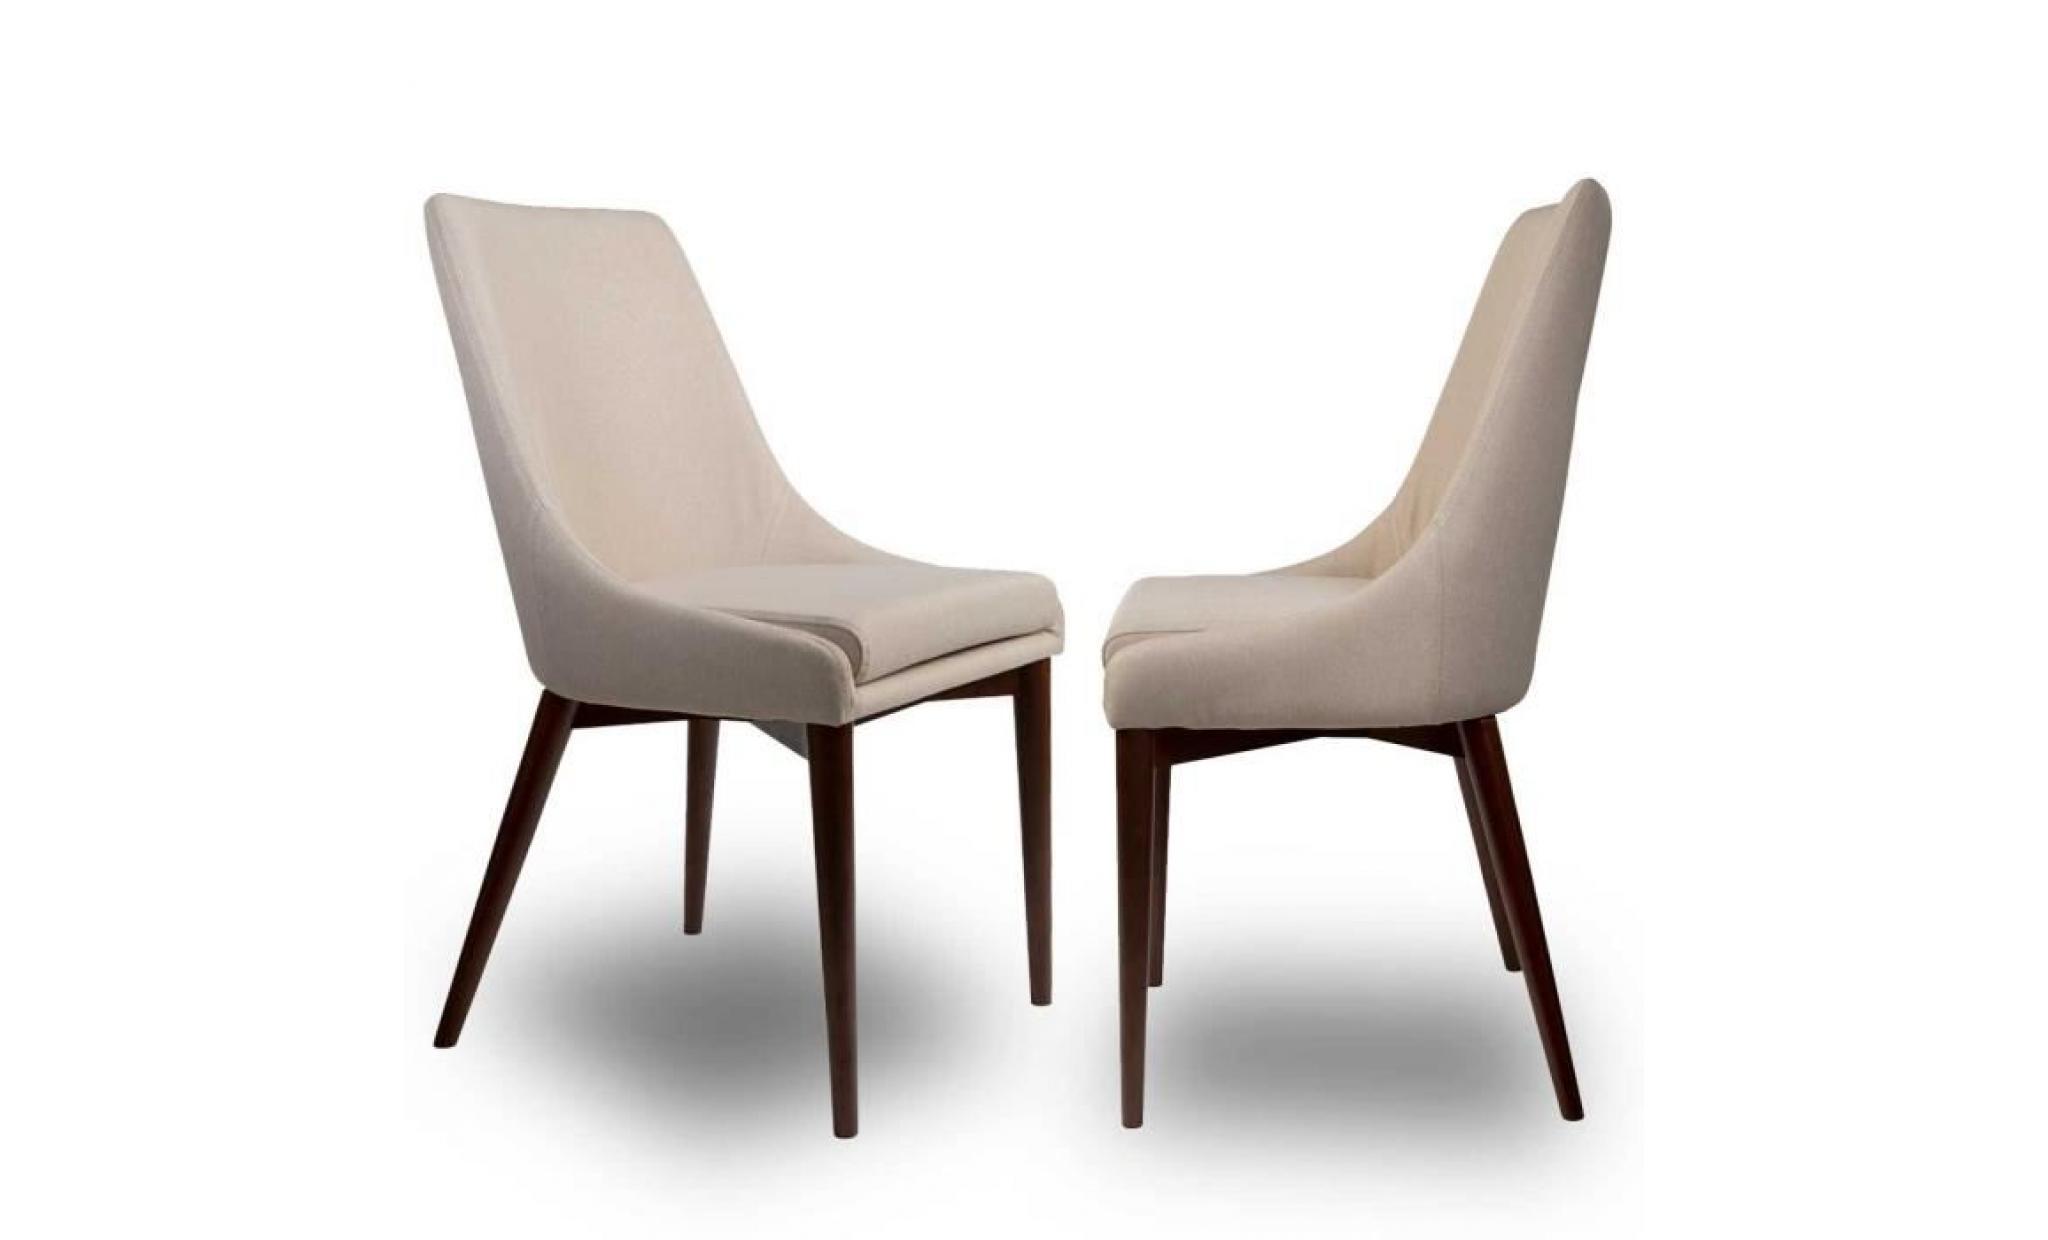 lot de 2 chaises tissu juju couleur